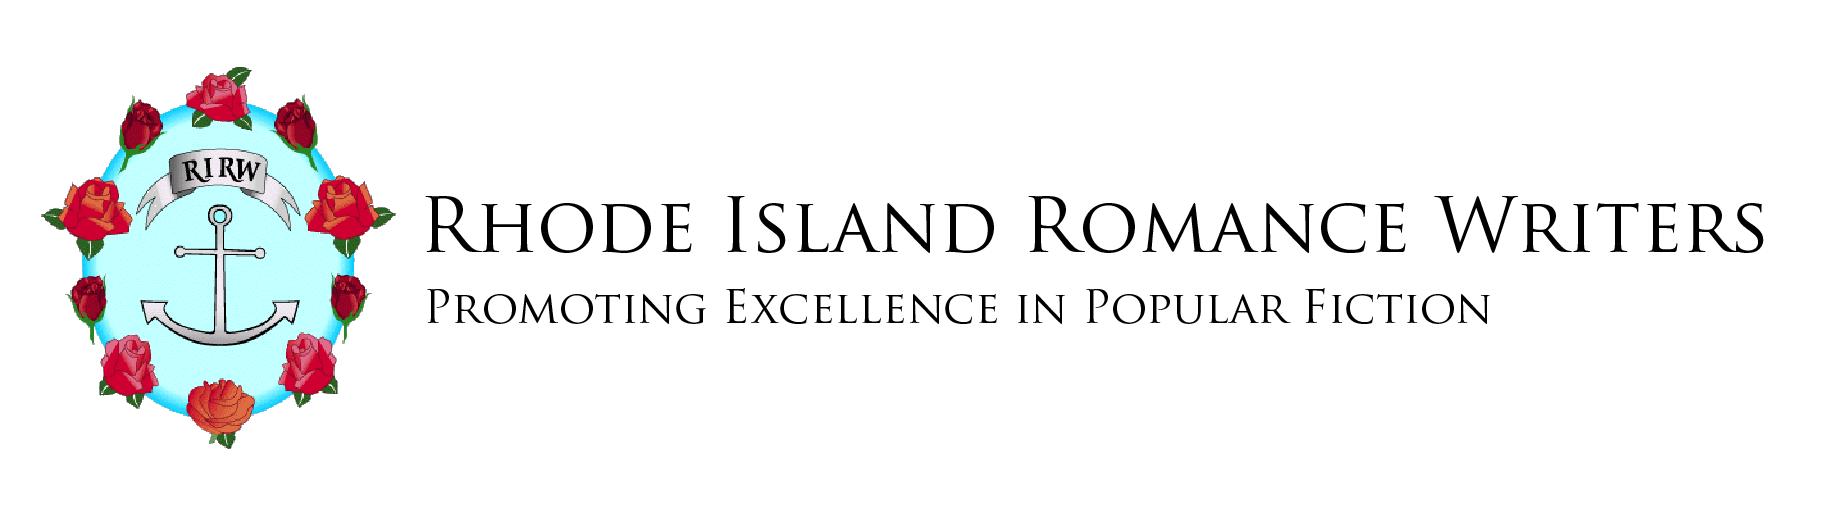 Rhode Island Romance Writers